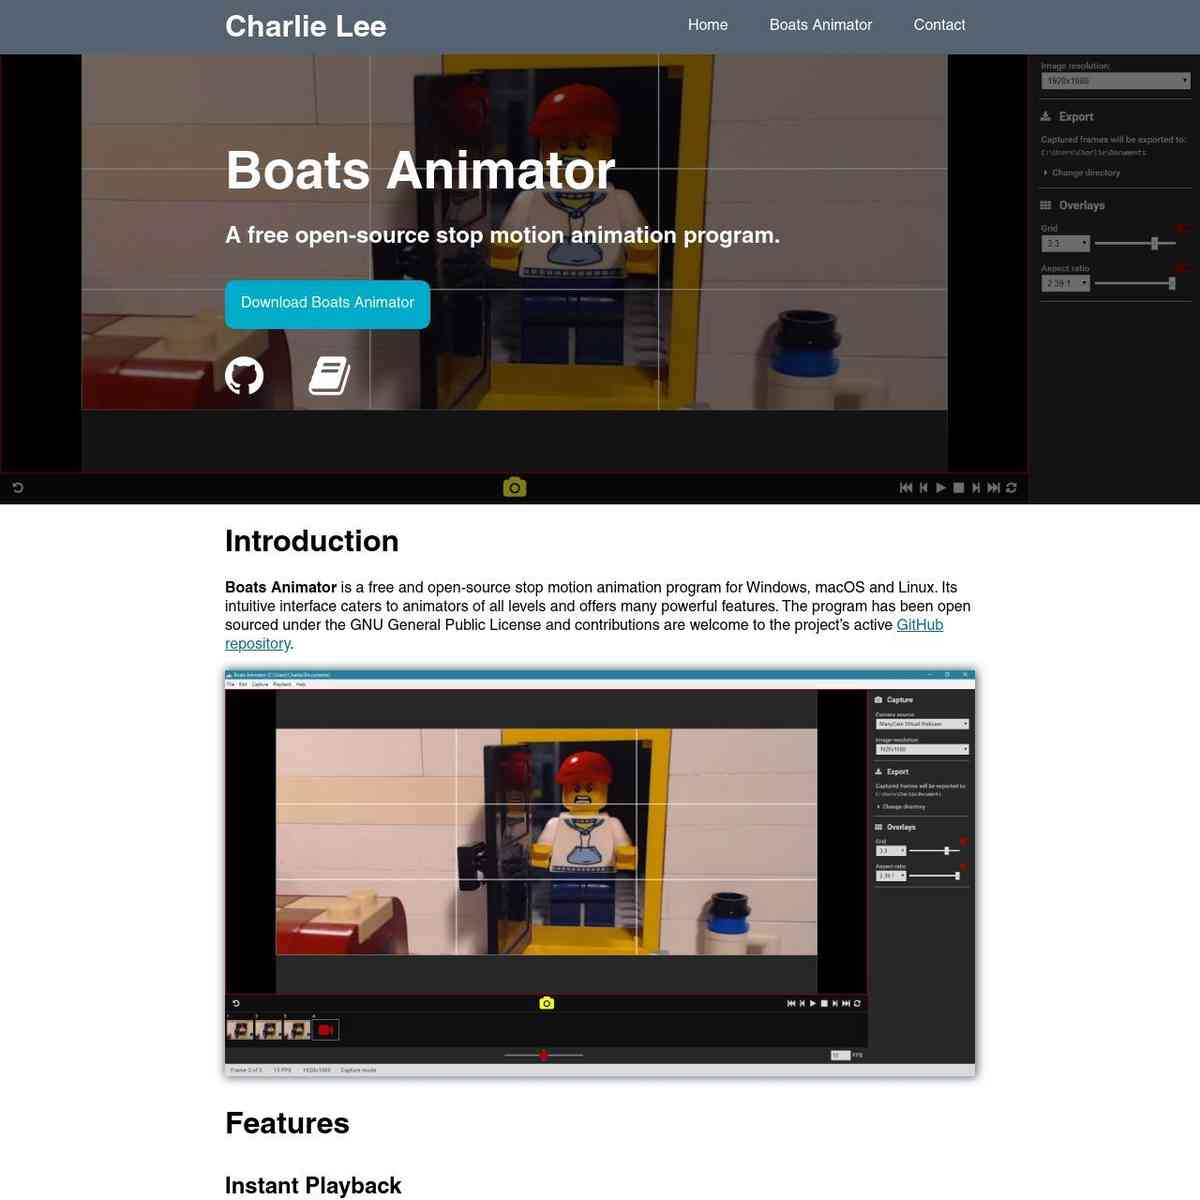 Boats Animator - Charlie Lee